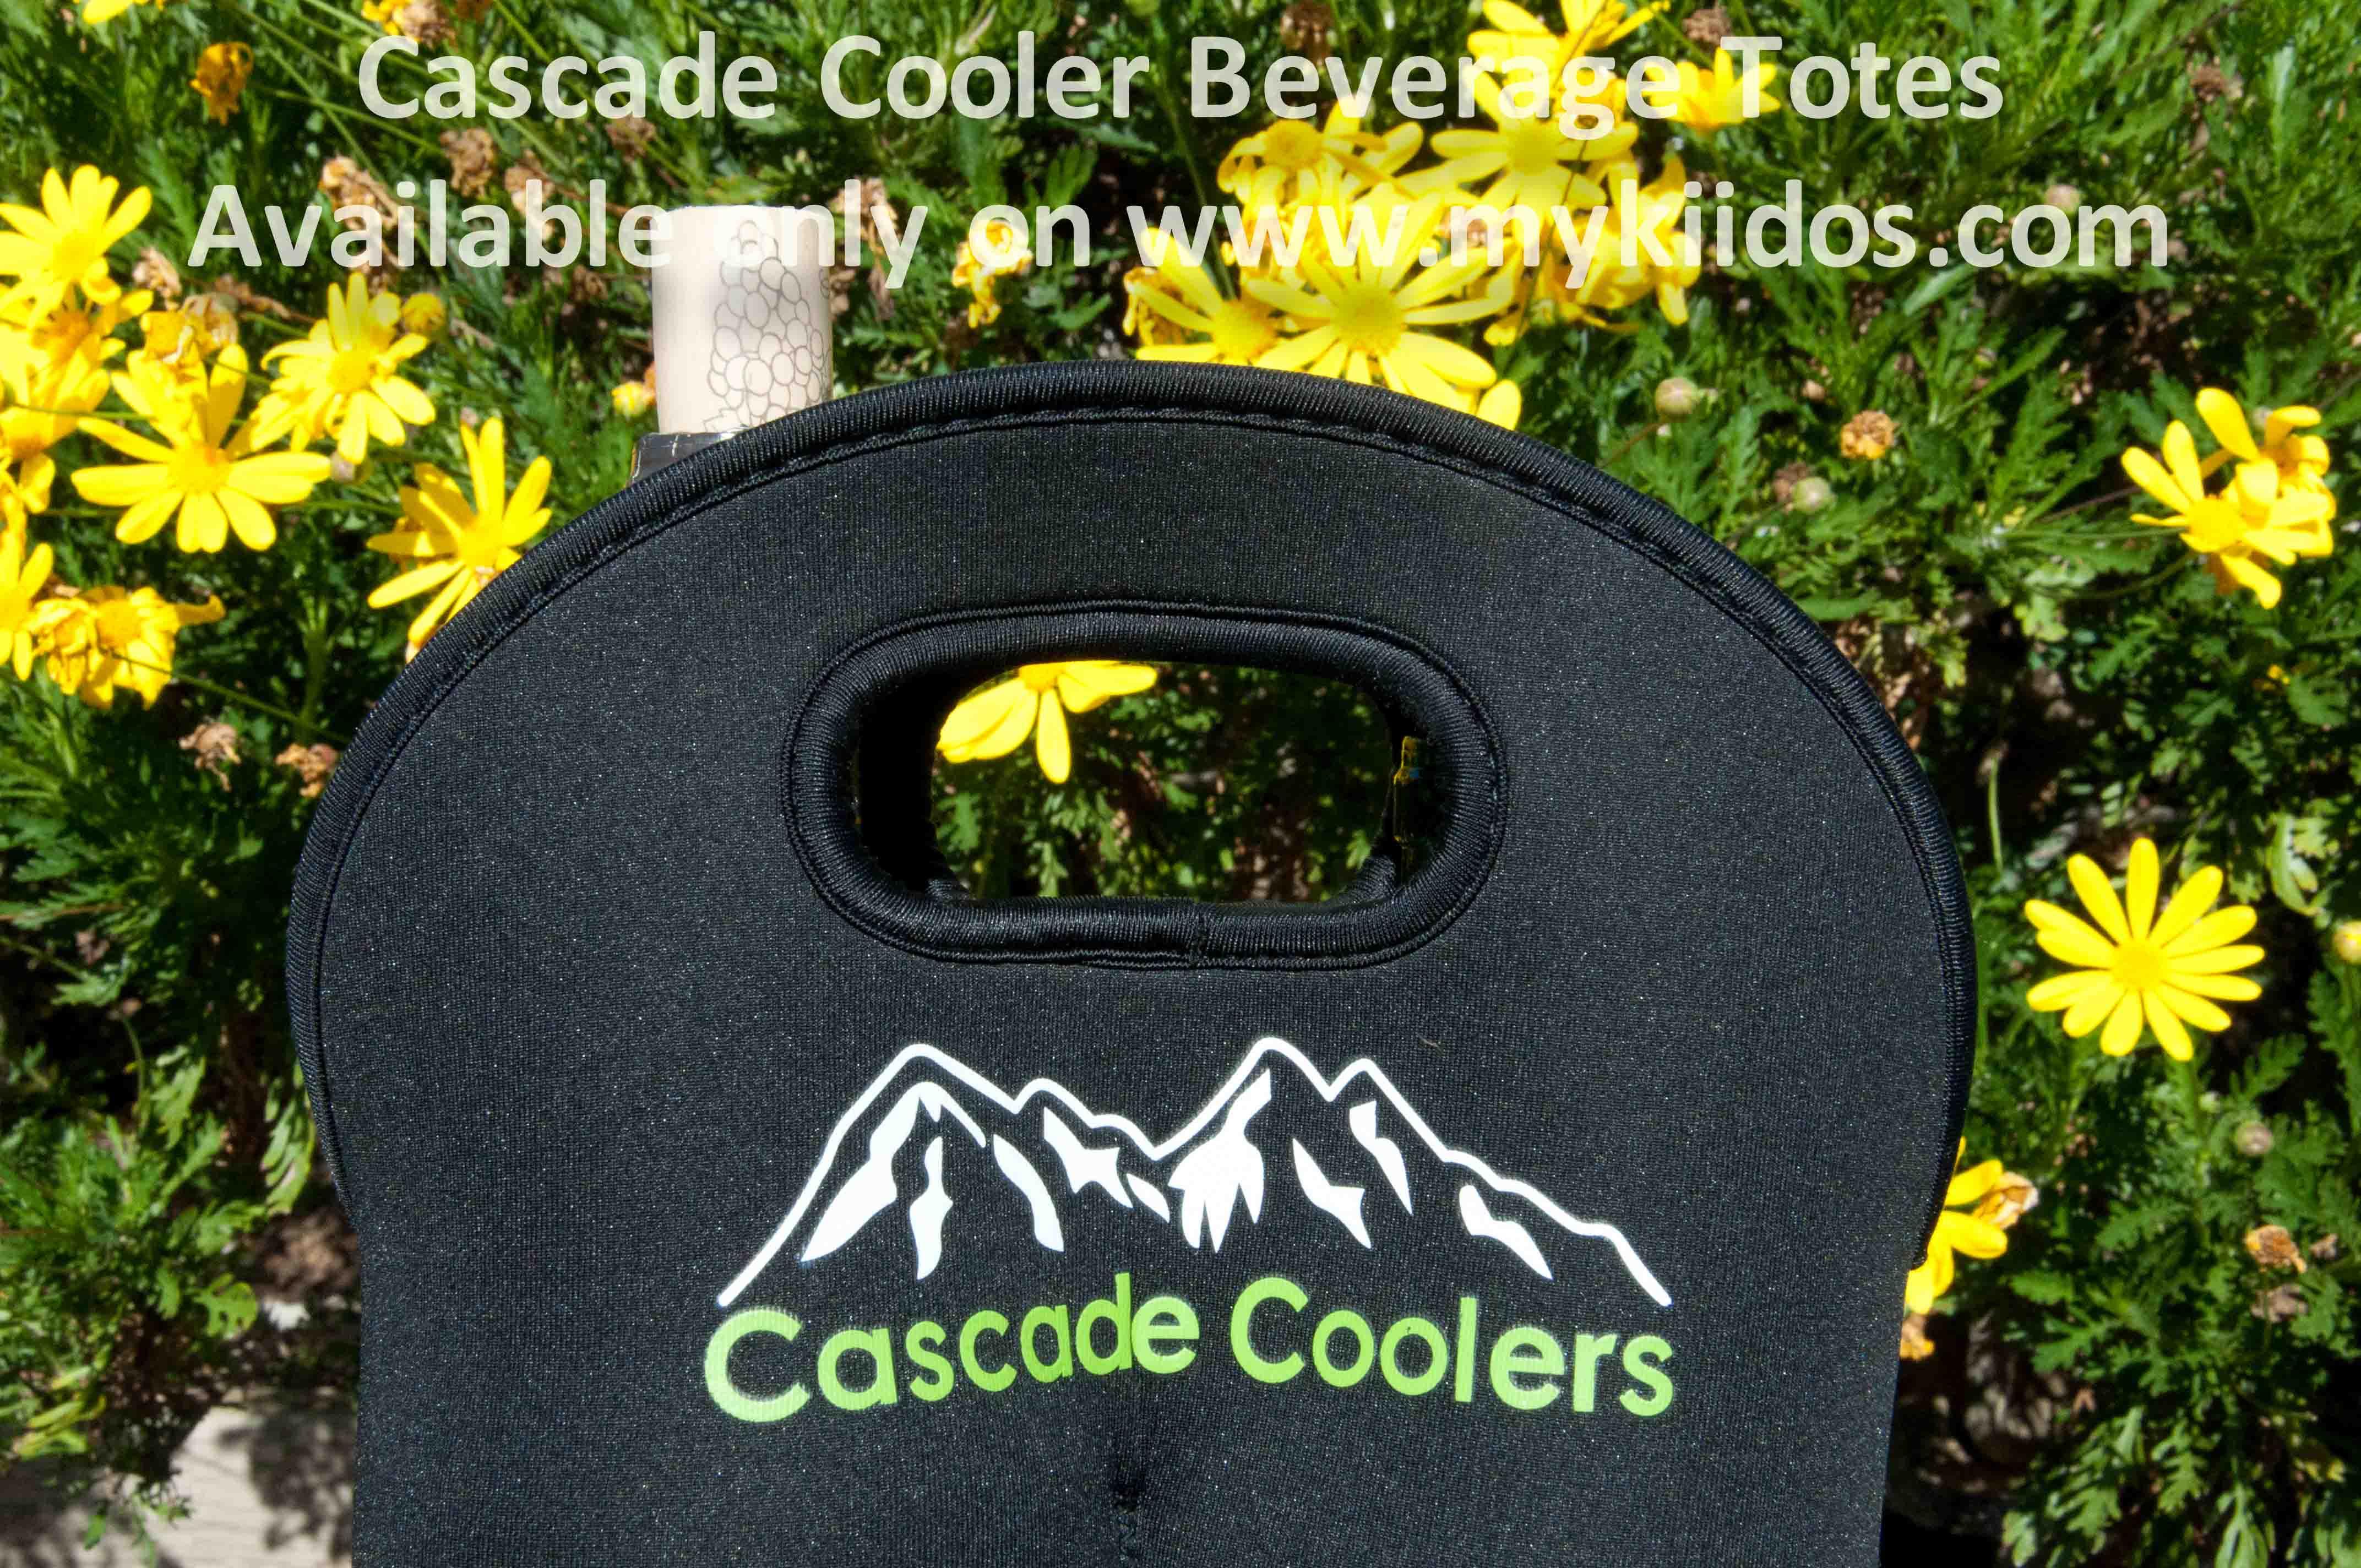 cascadecoolers-2